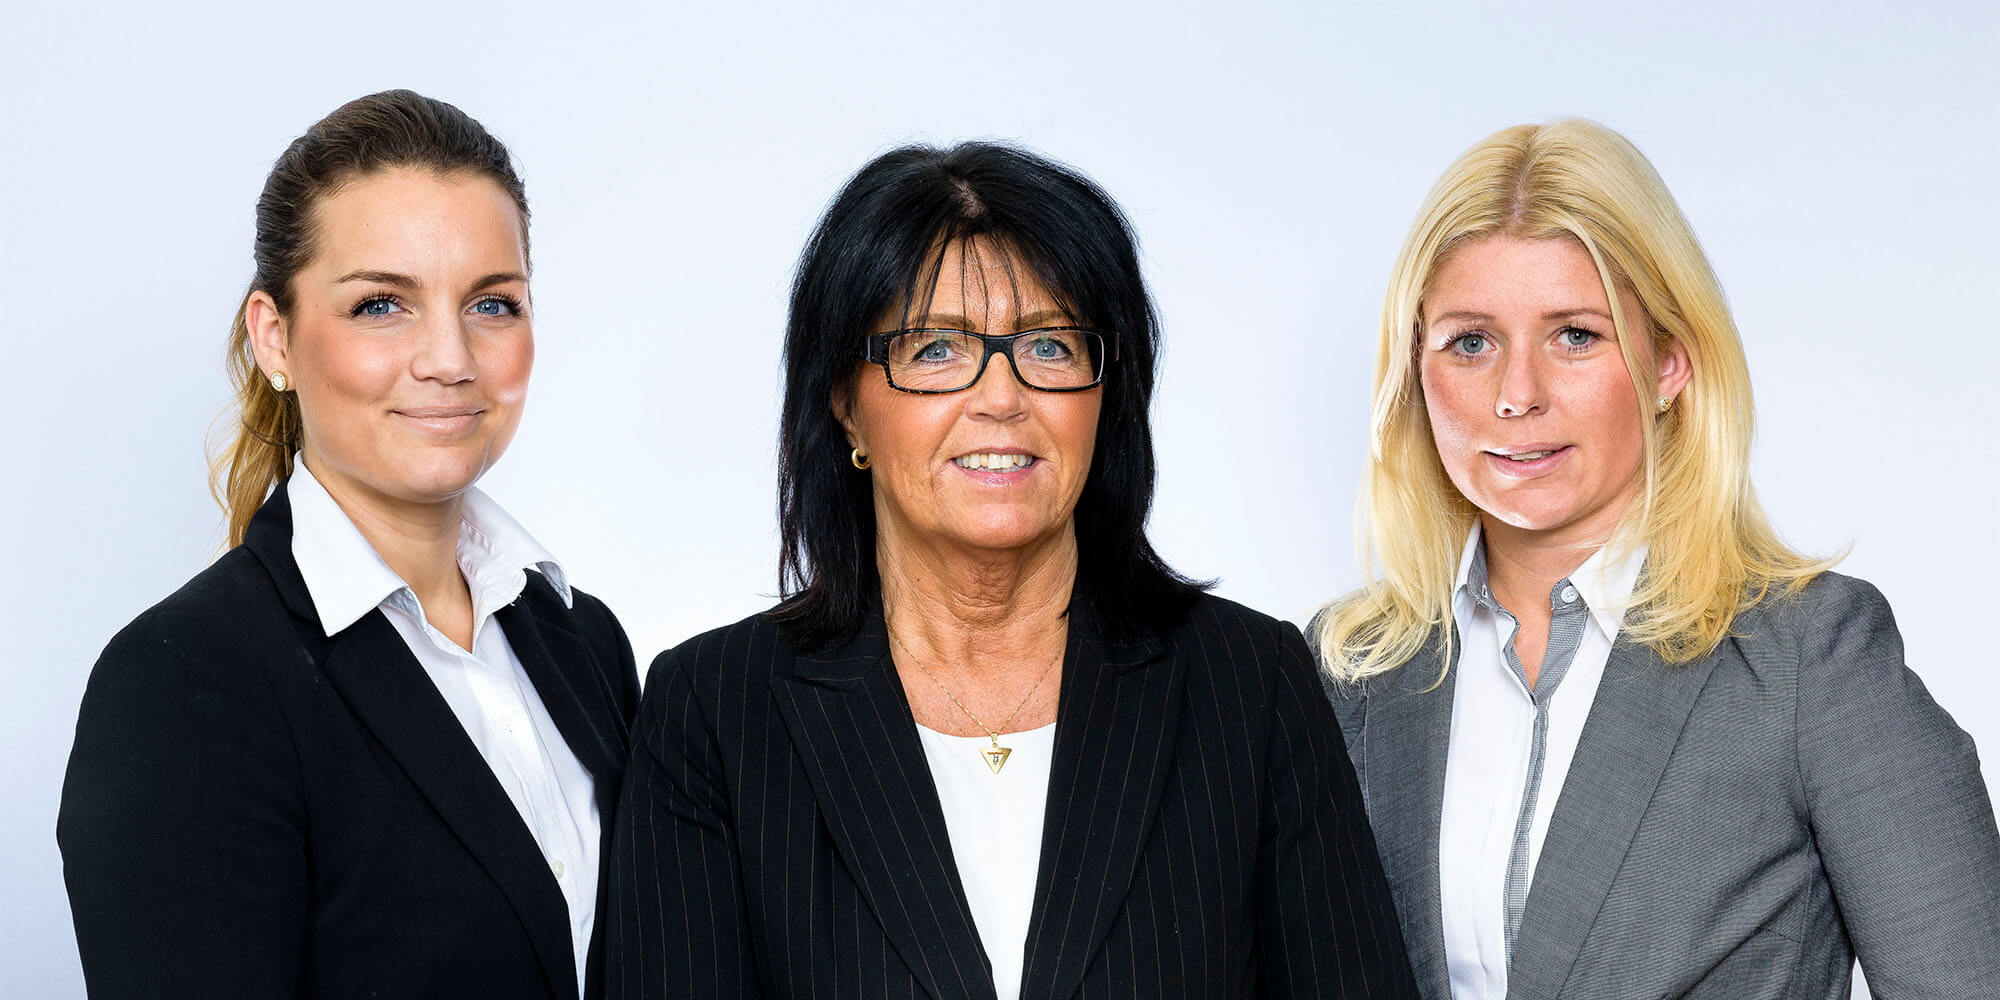 Advokatfirman Svensson & Berg